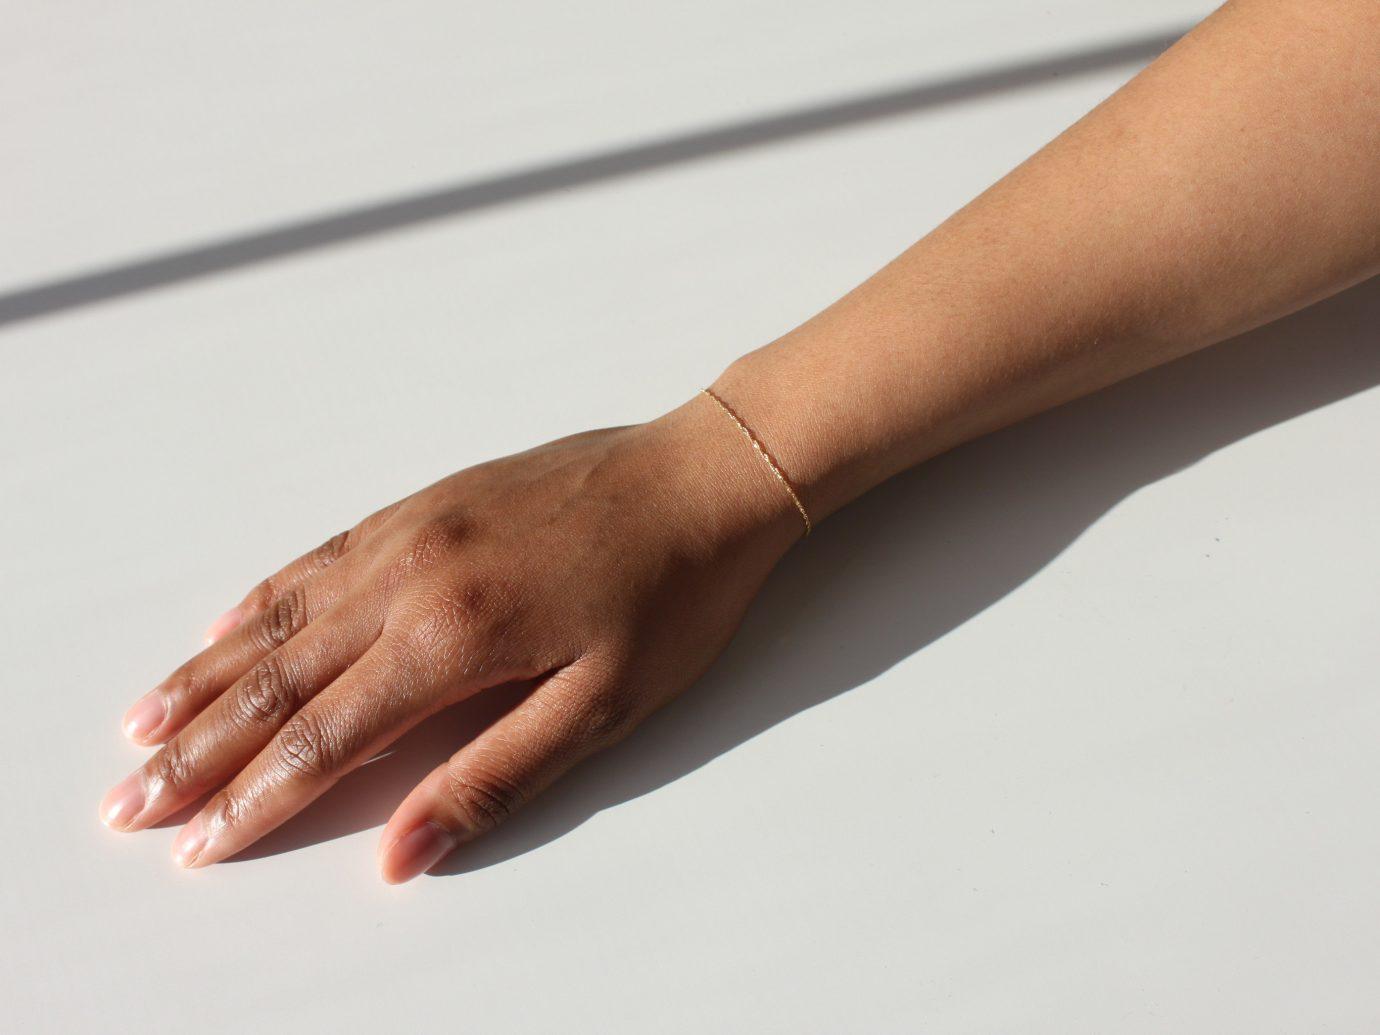 Style + Design person finger hand arm close up leg sense human body